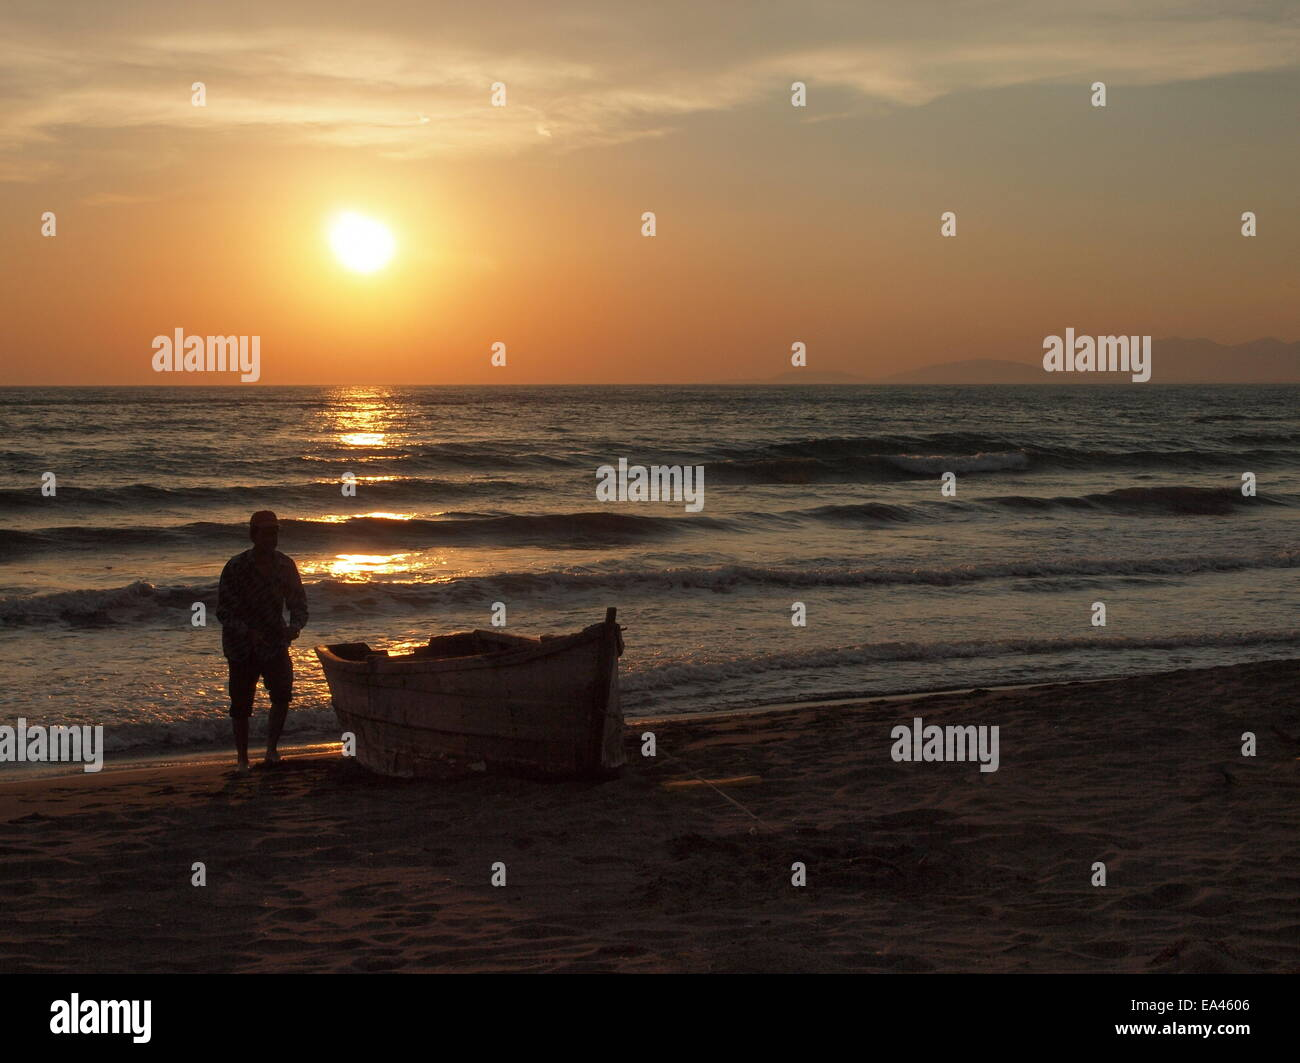 Fisherman in Albania at sunset - Stock Image